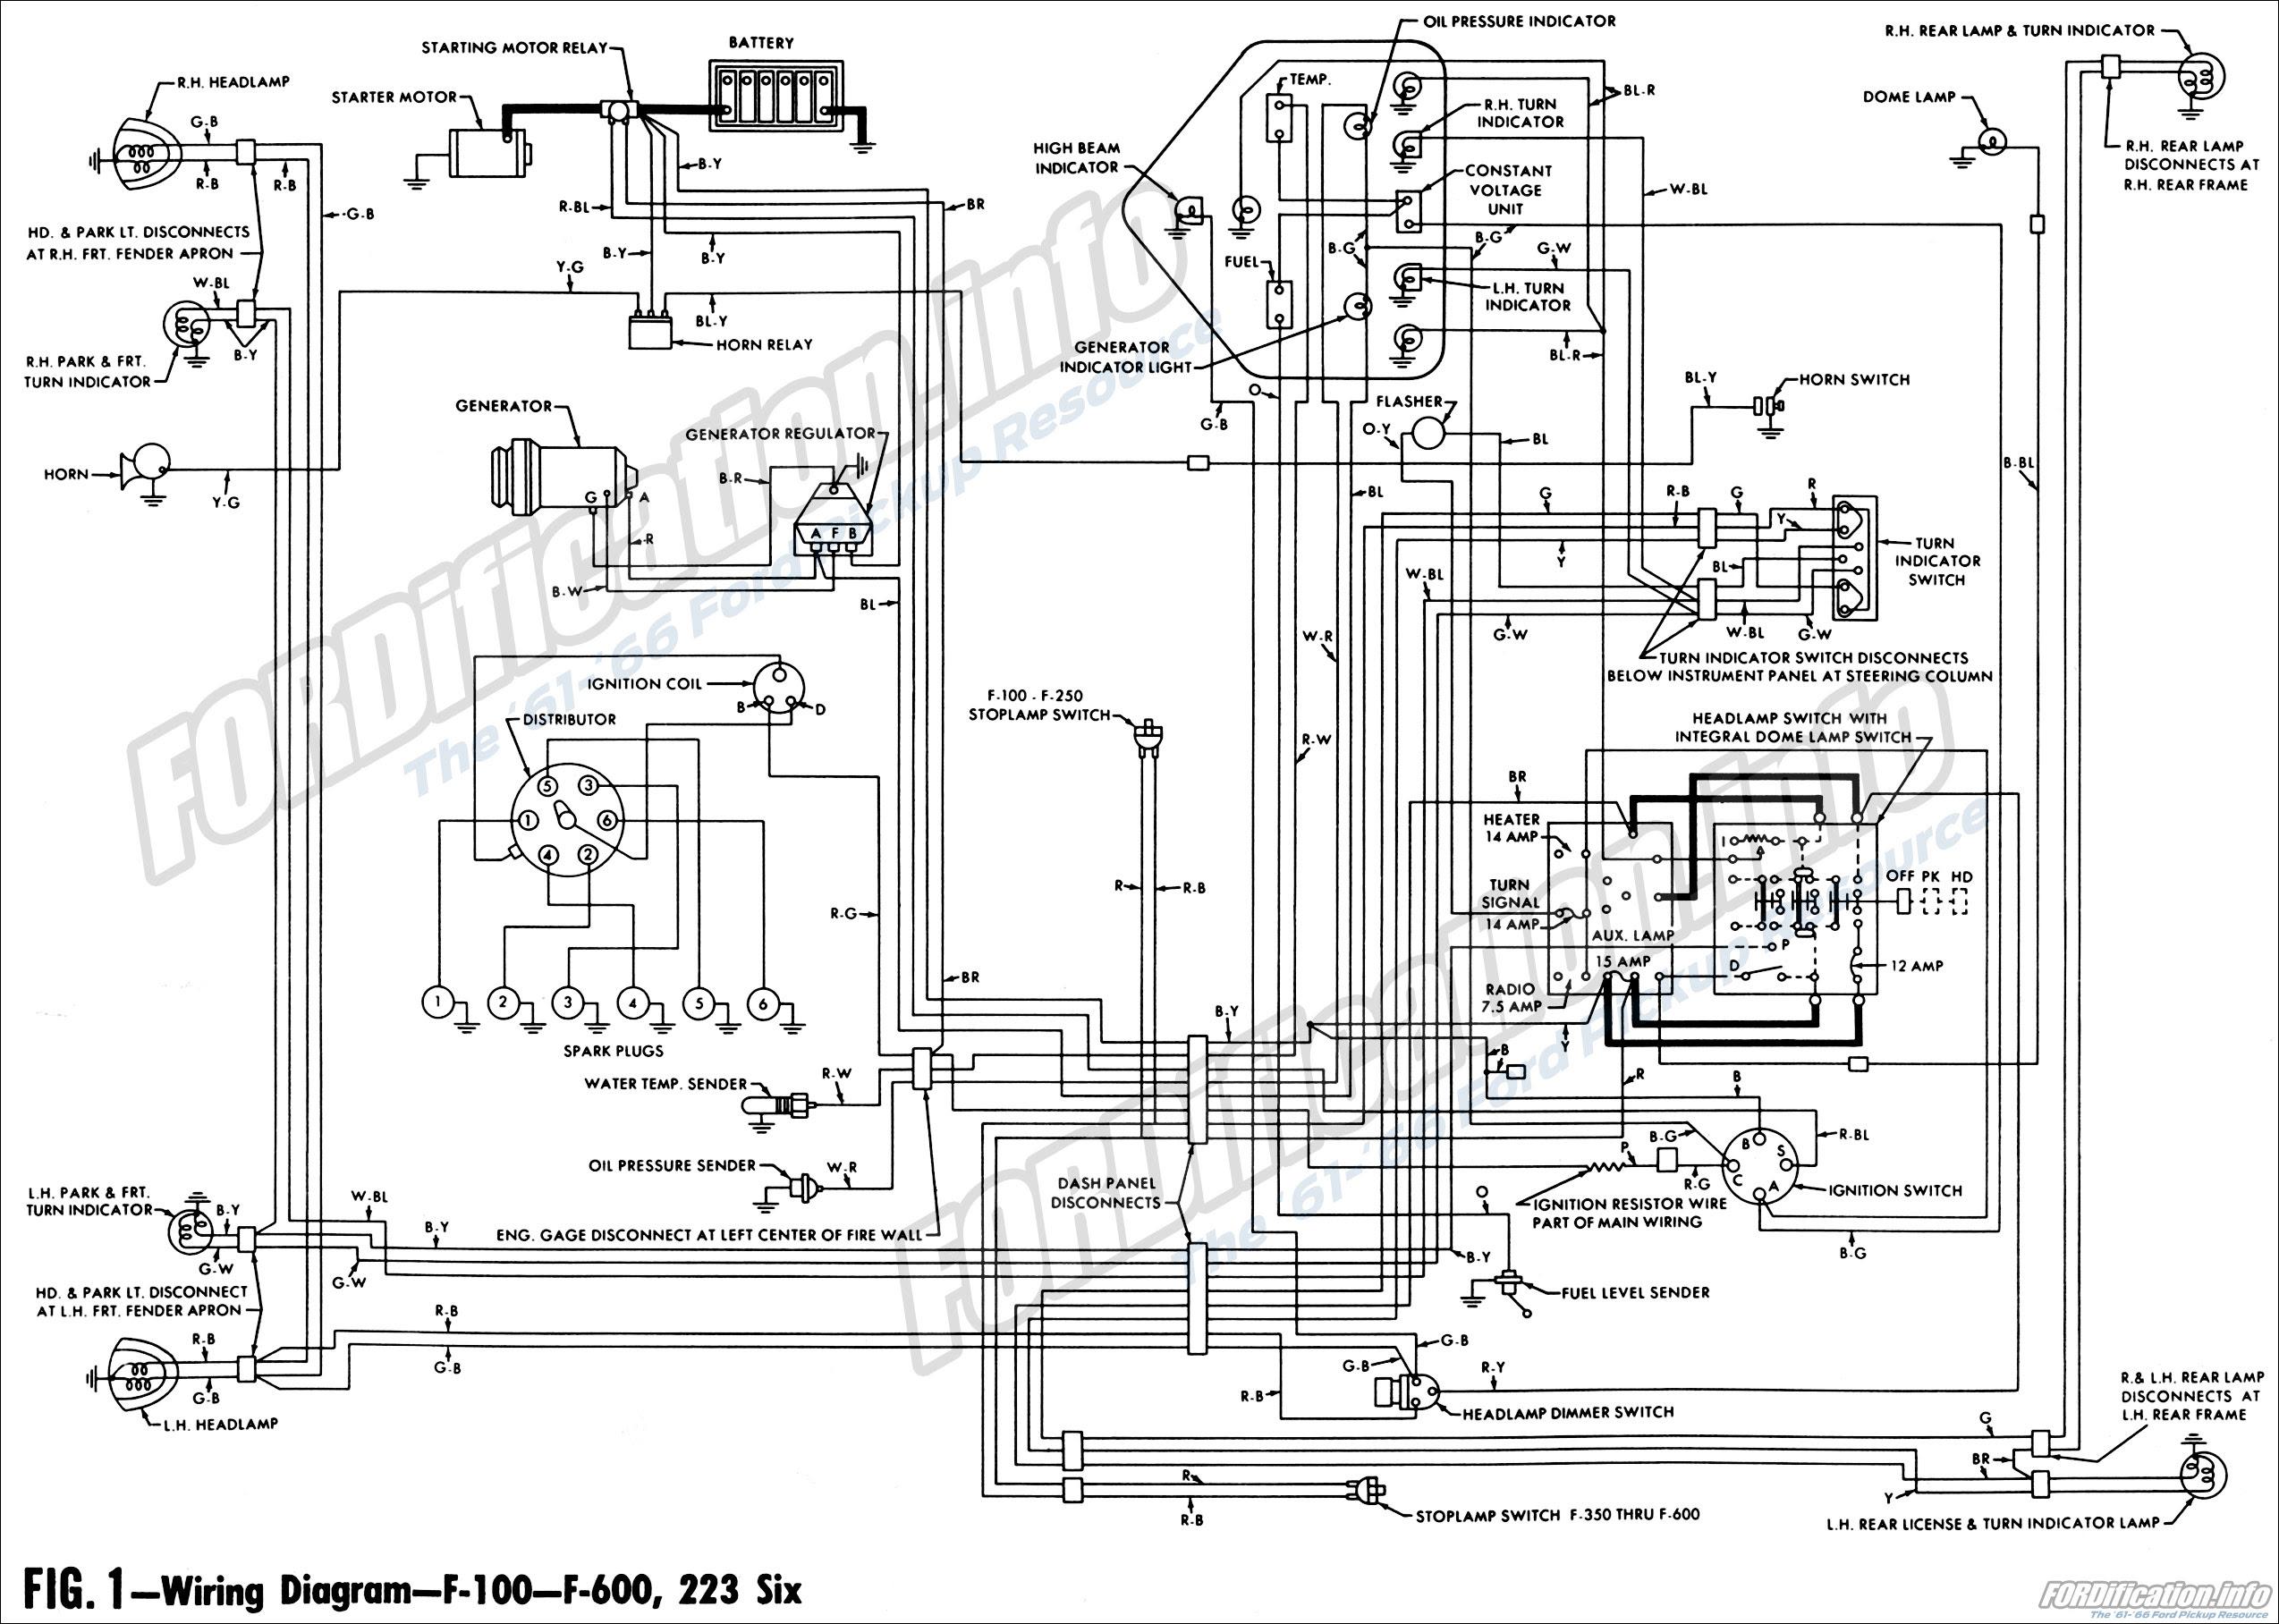 1983 Ford F100 Wiring Diagram 1982 Chevy Truck Door Wiring Bege Wiring Diagram